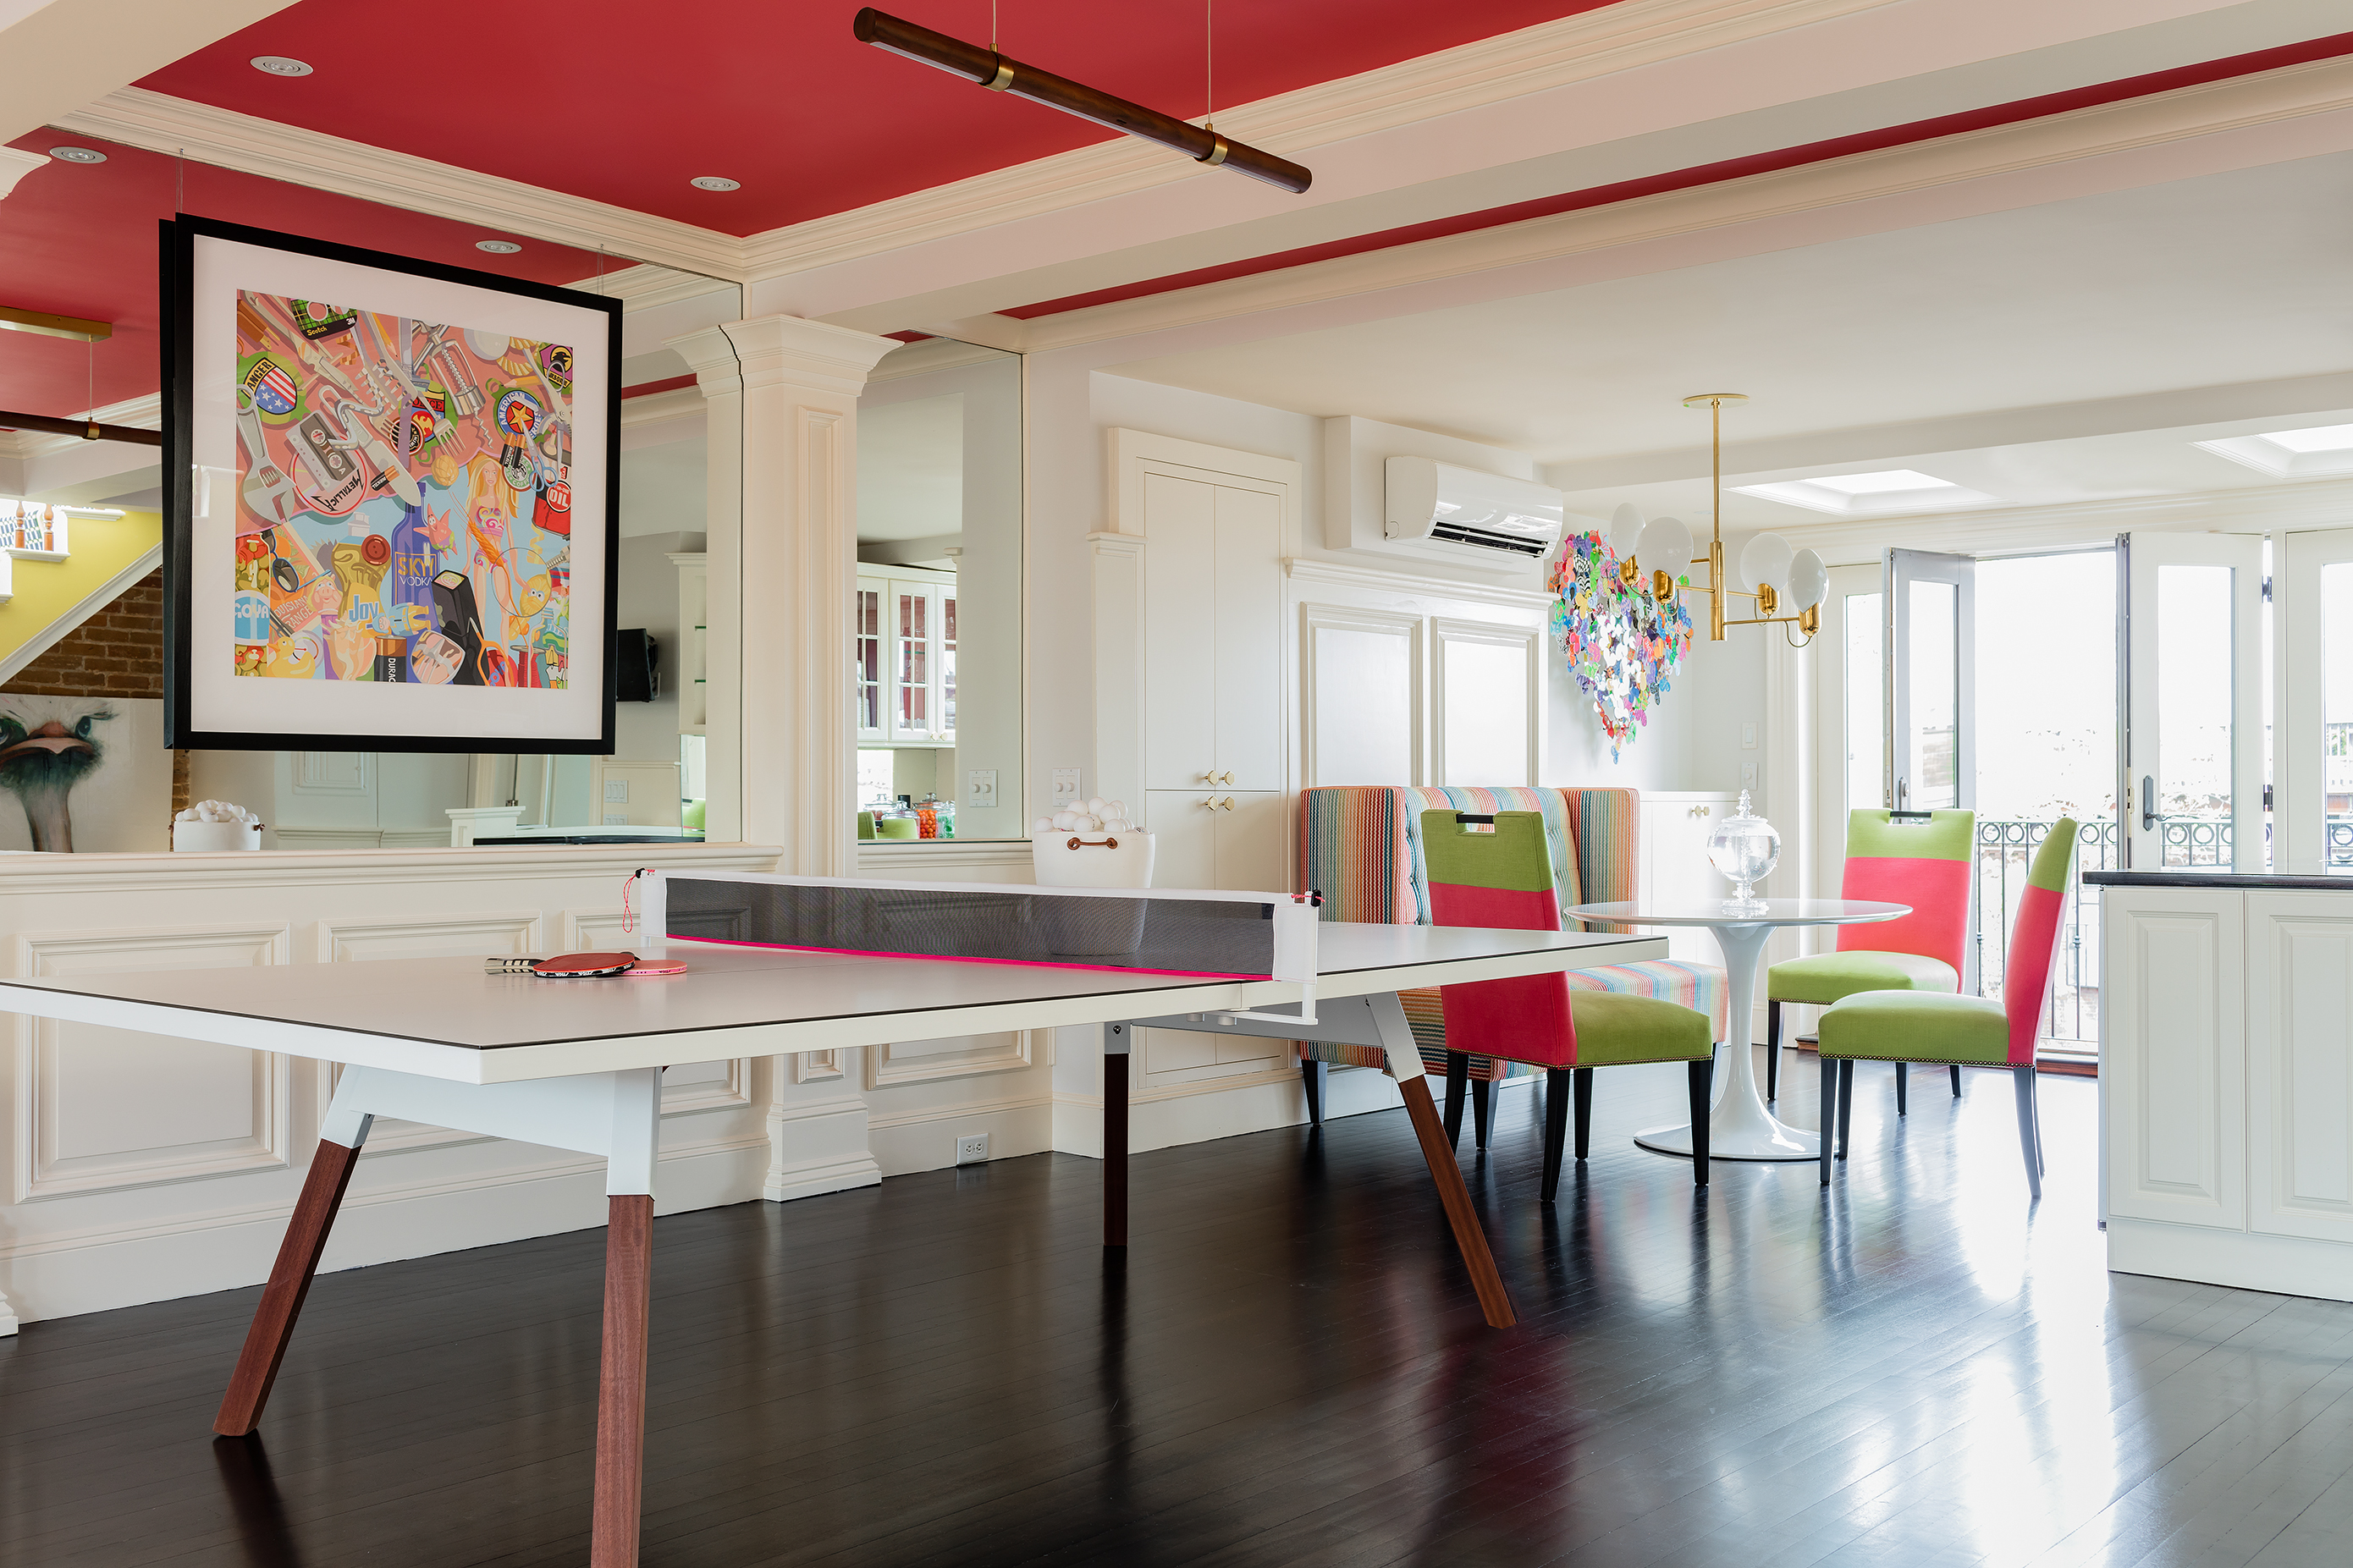 dining-room-by-liz-caan-interior-design-south-end-brownstone